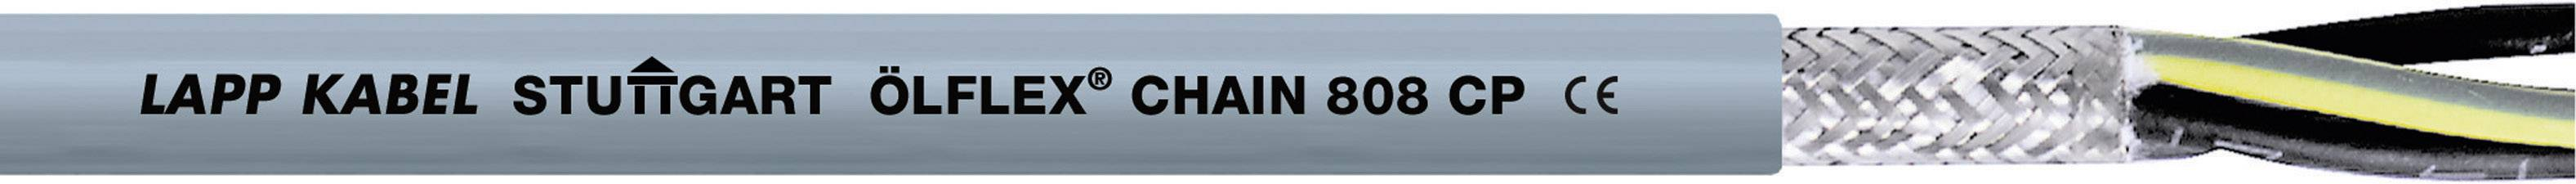 Žíla kabelu LappKabel ÖLFLEX CHAIN 808 CP 12G1,5 (1027780), 12x 1,5 mm², polyurethan, Ø 13,3 mm, stíněný, 50 m